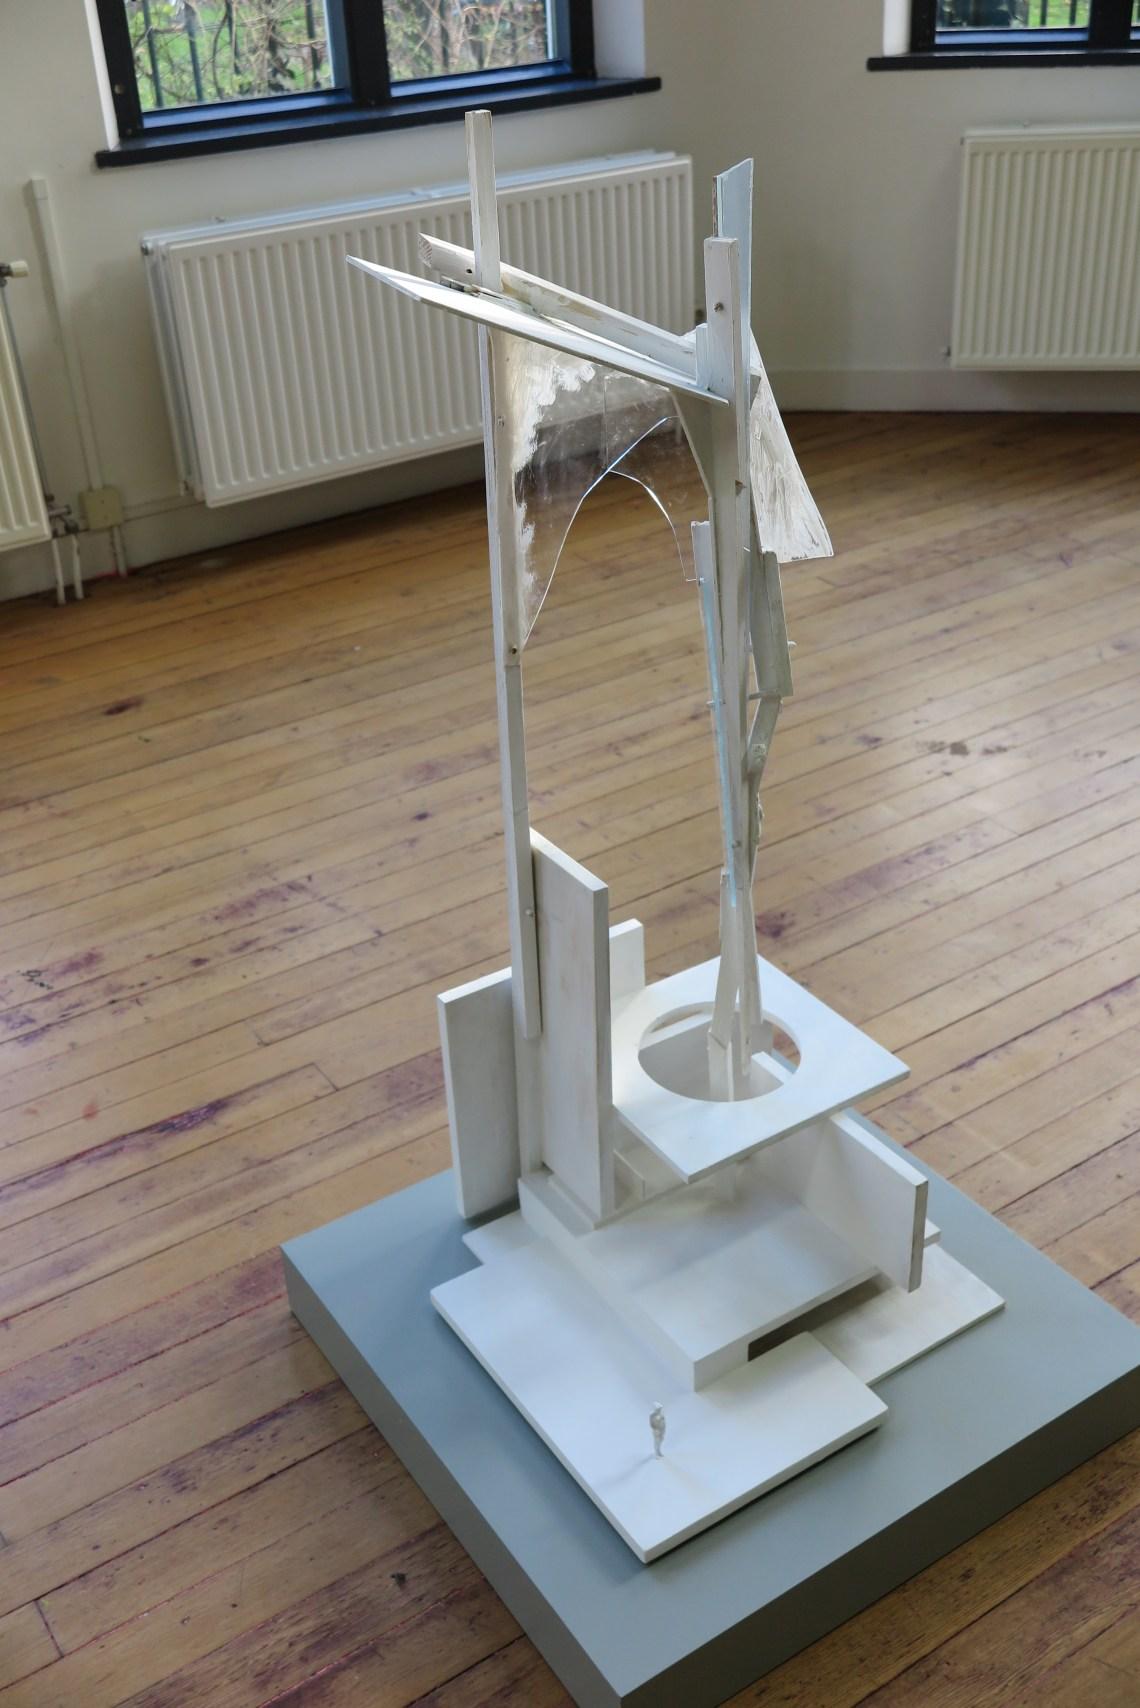 I love modernism, modernism loves me - Andre Kruysen - Object